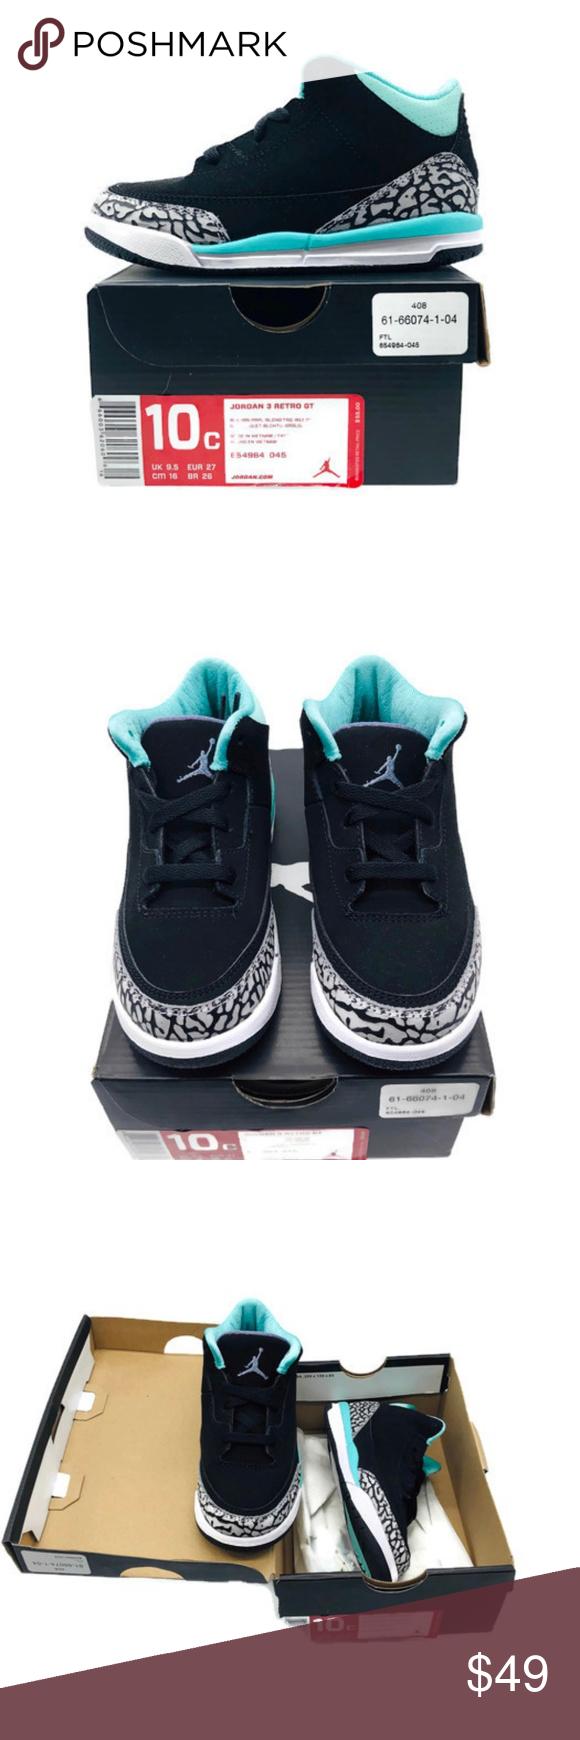 new arrival 3bac9 0a629 Children's Jordan sneakers! New in the box, Jordan 3 Retro ...